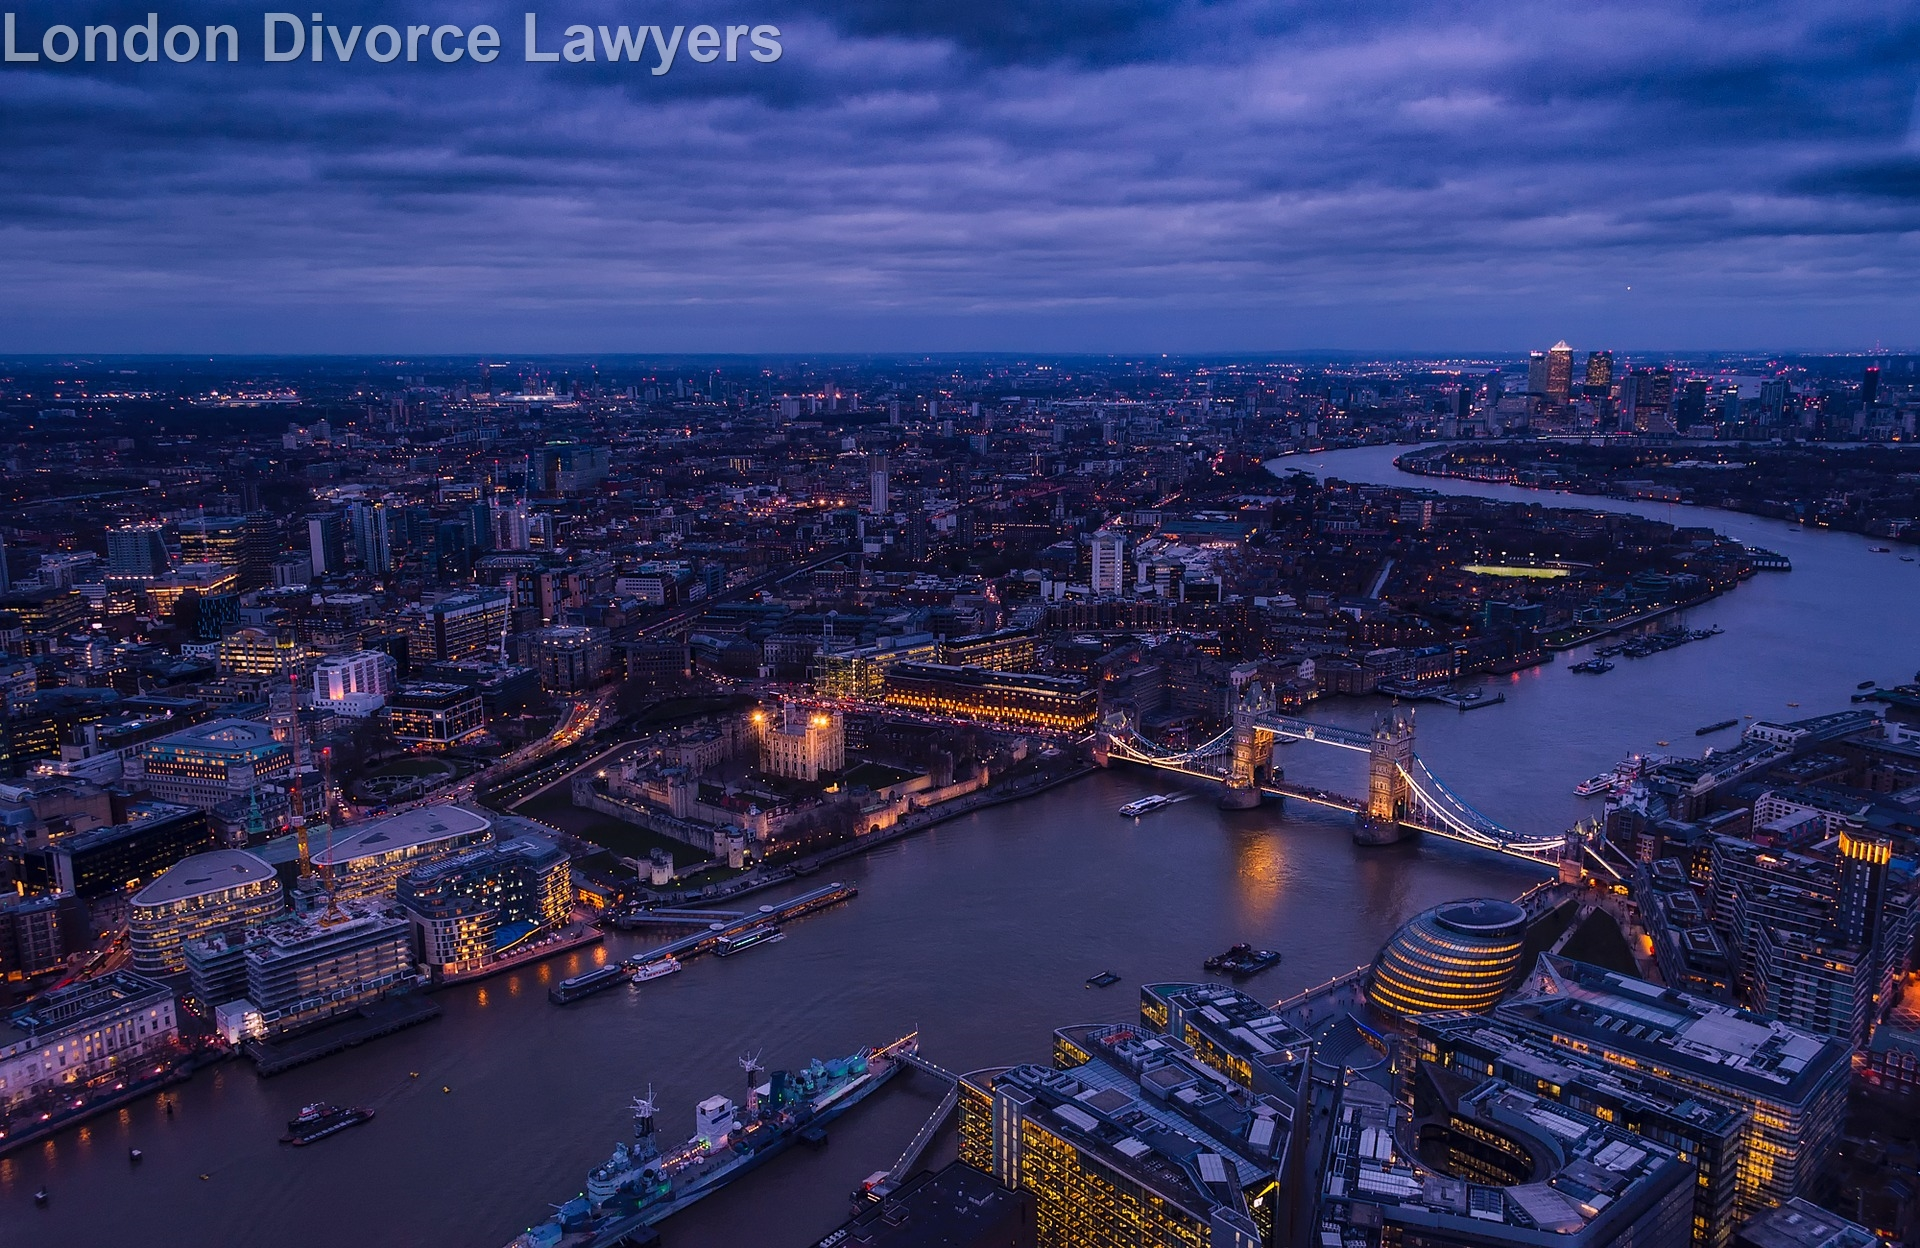 London Divorce Lawyers 3